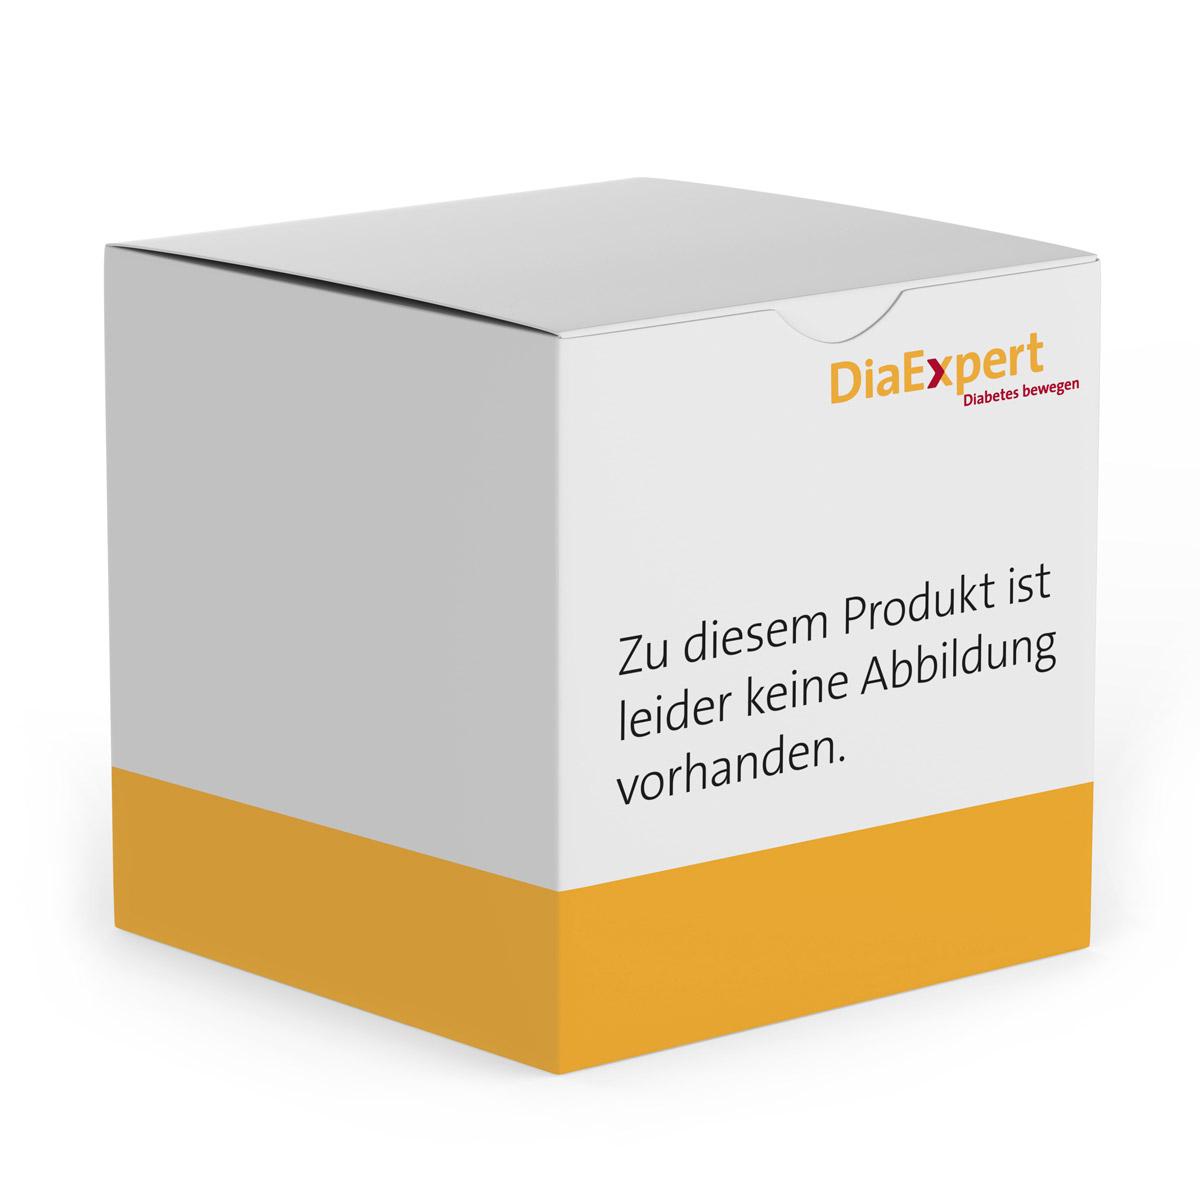 GlucoMen LX ß-Ketone Sensor Teststreifen 10 Stück